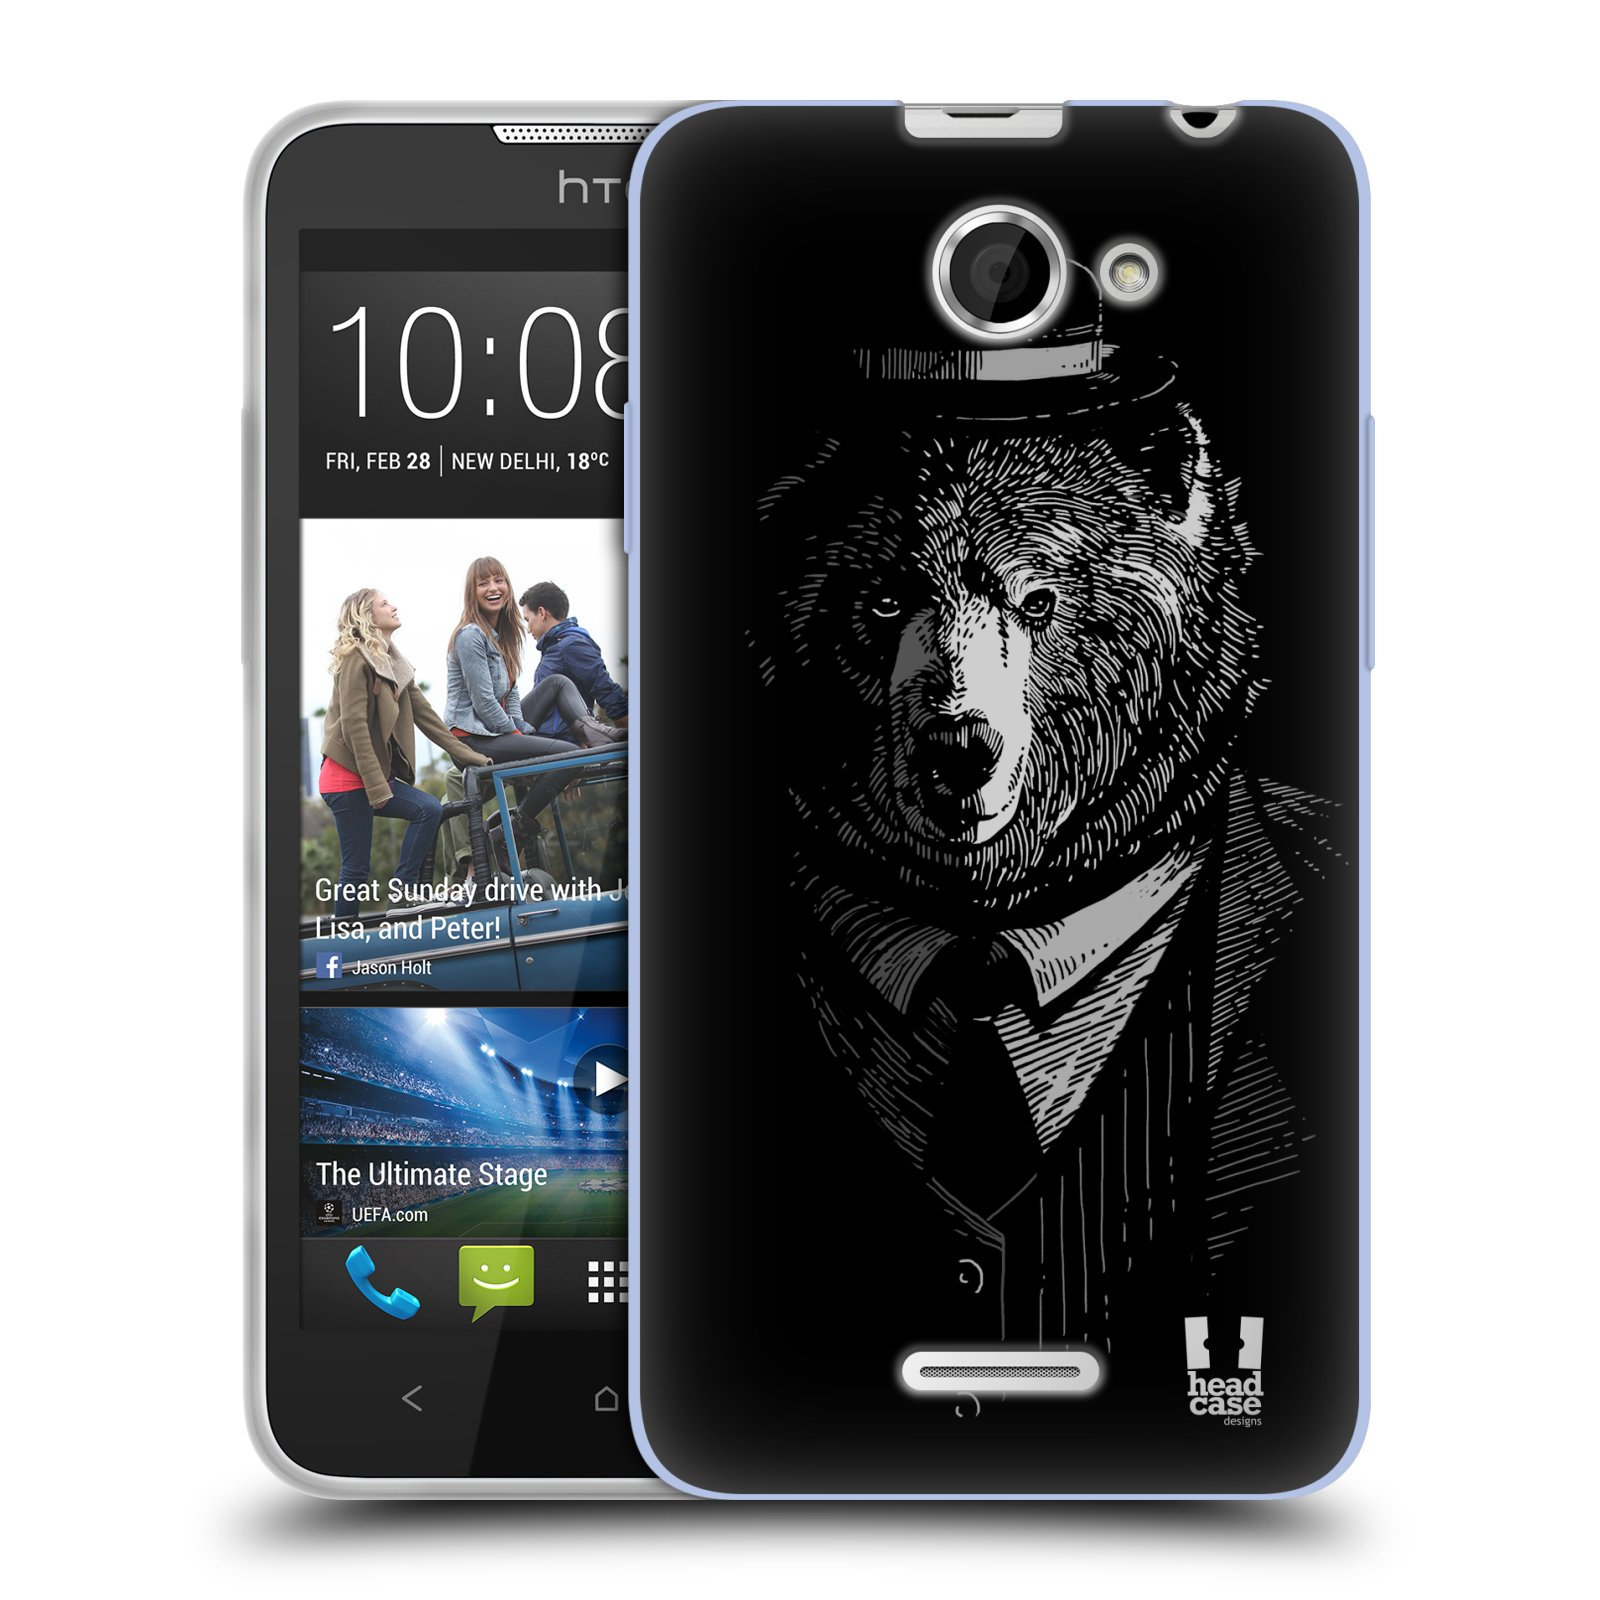 Silikonové pouzdro na mobil HTC Desire 516 HEAD CASE MEDVĚD V KVÁDRU (Silikonový kryt či obal na mobilní telefon HTC Desire 516 Dual SIM)